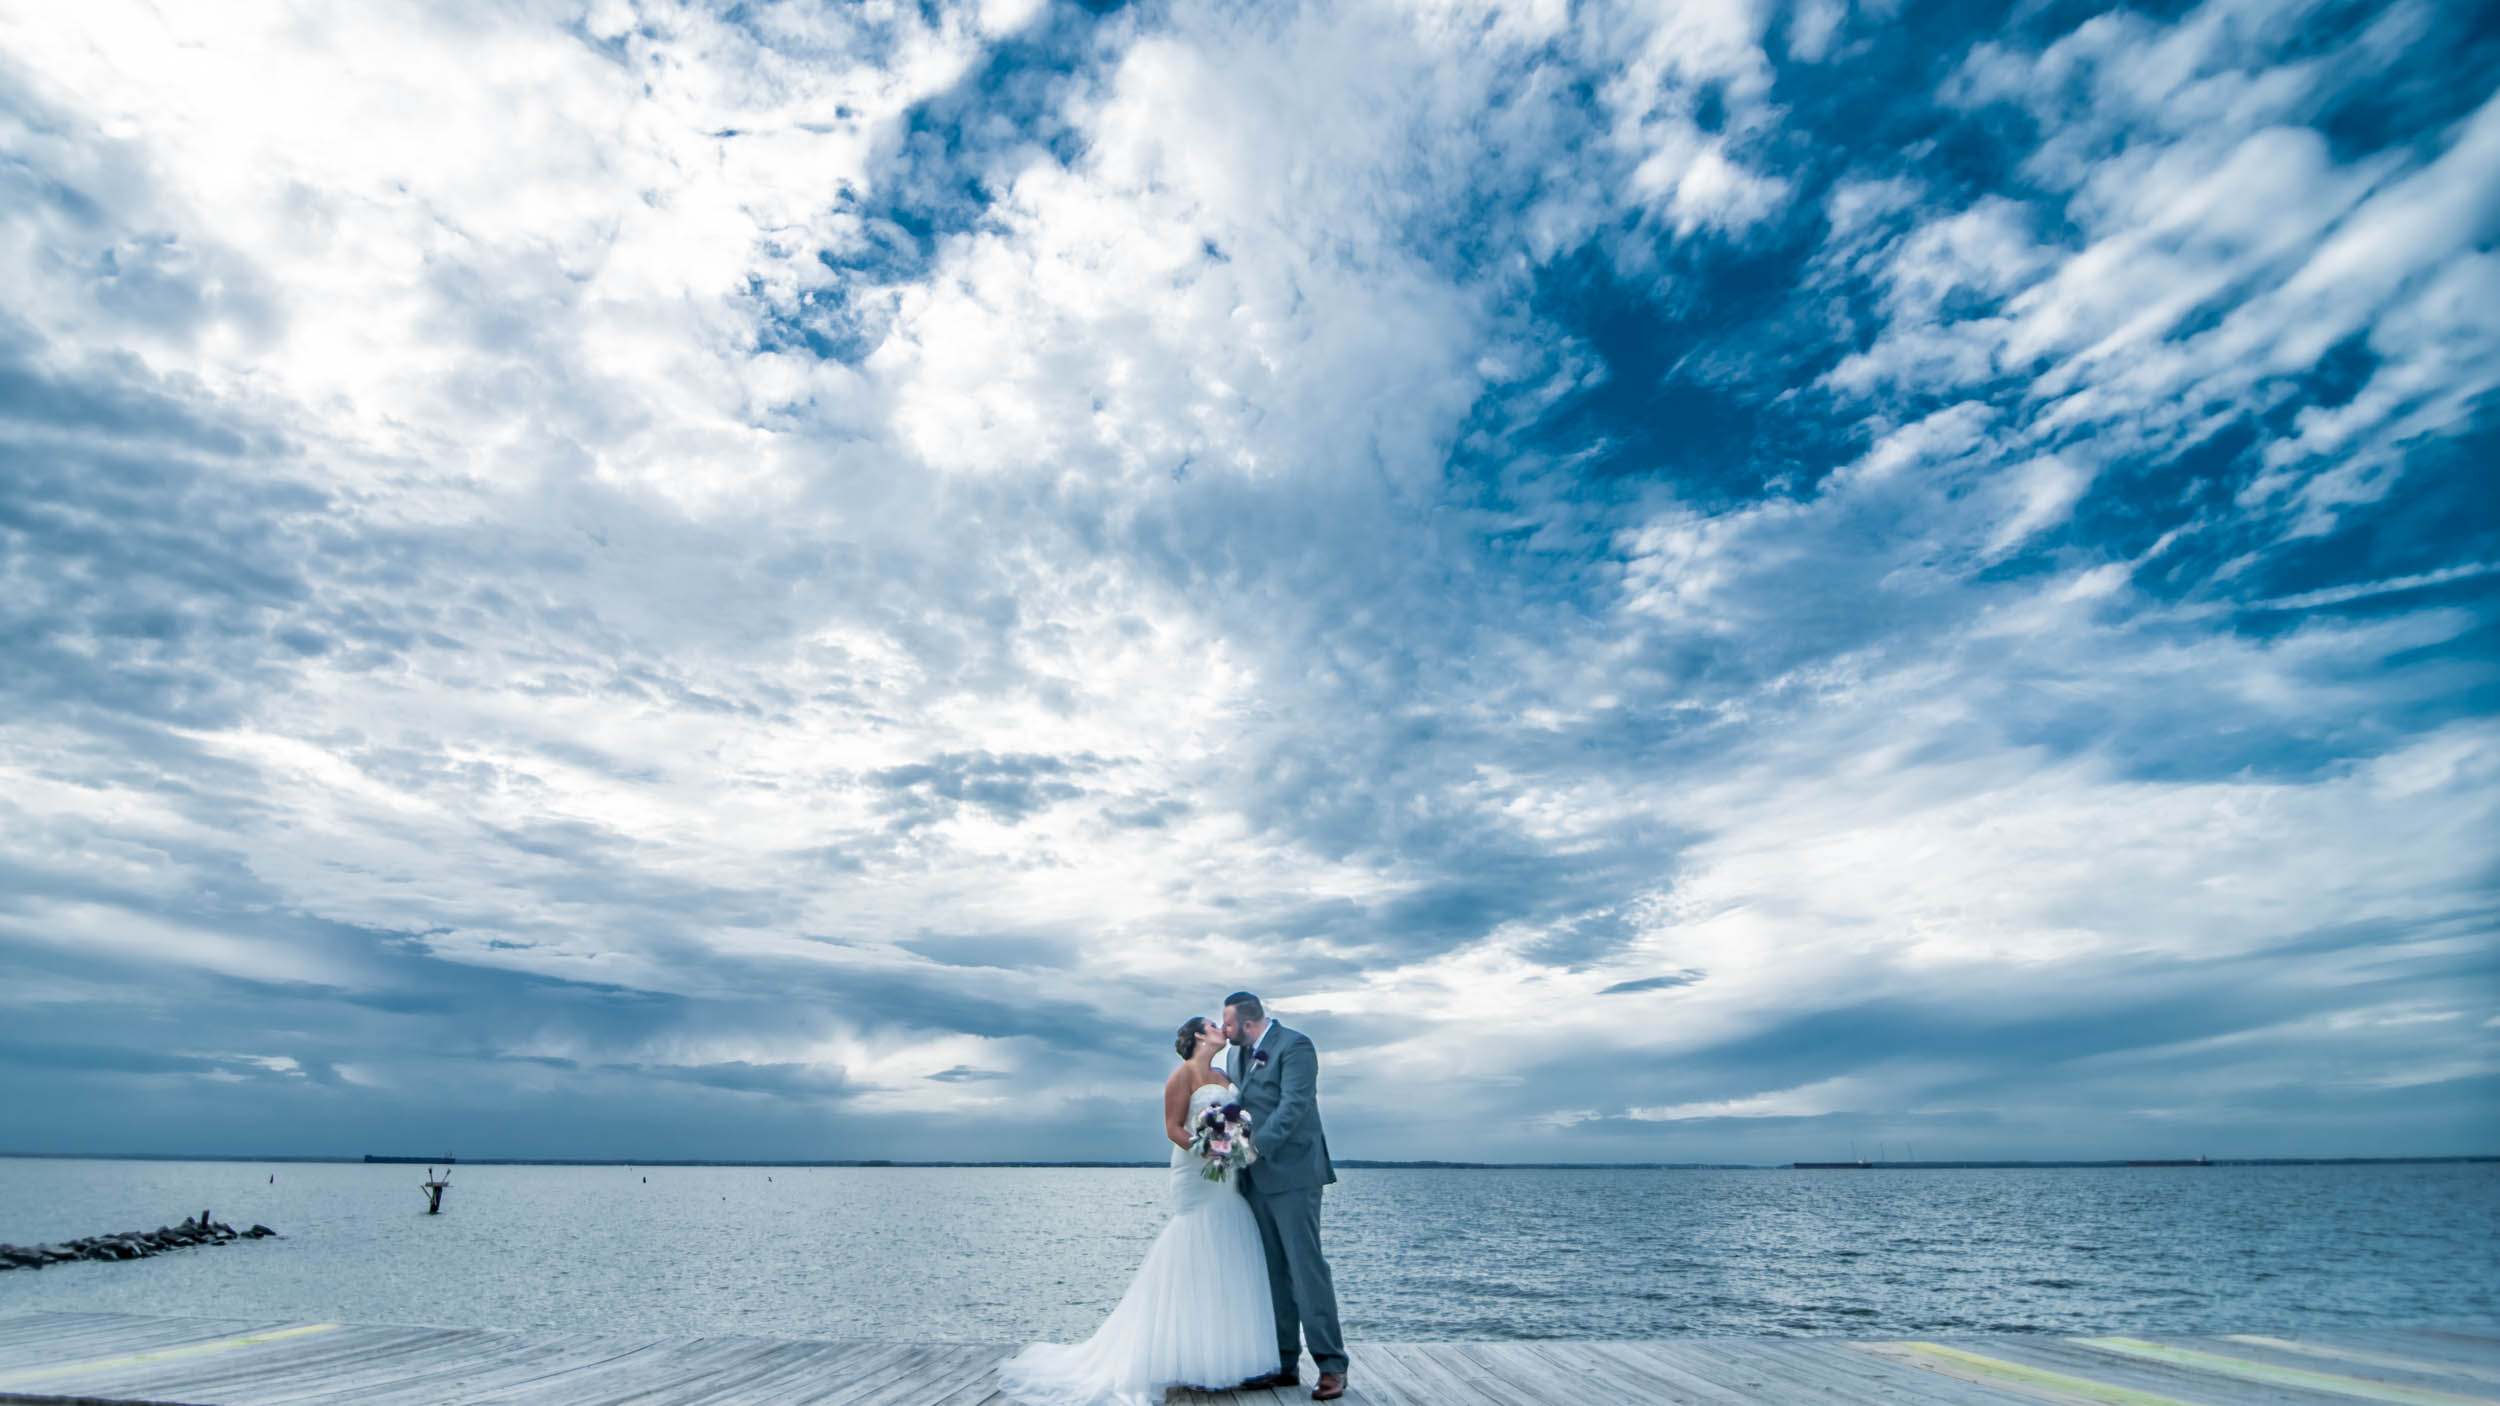 dc+metro+wedding+photographer+vadym+guliuk+photography+wedding+bride+and+groom-2063.jpg